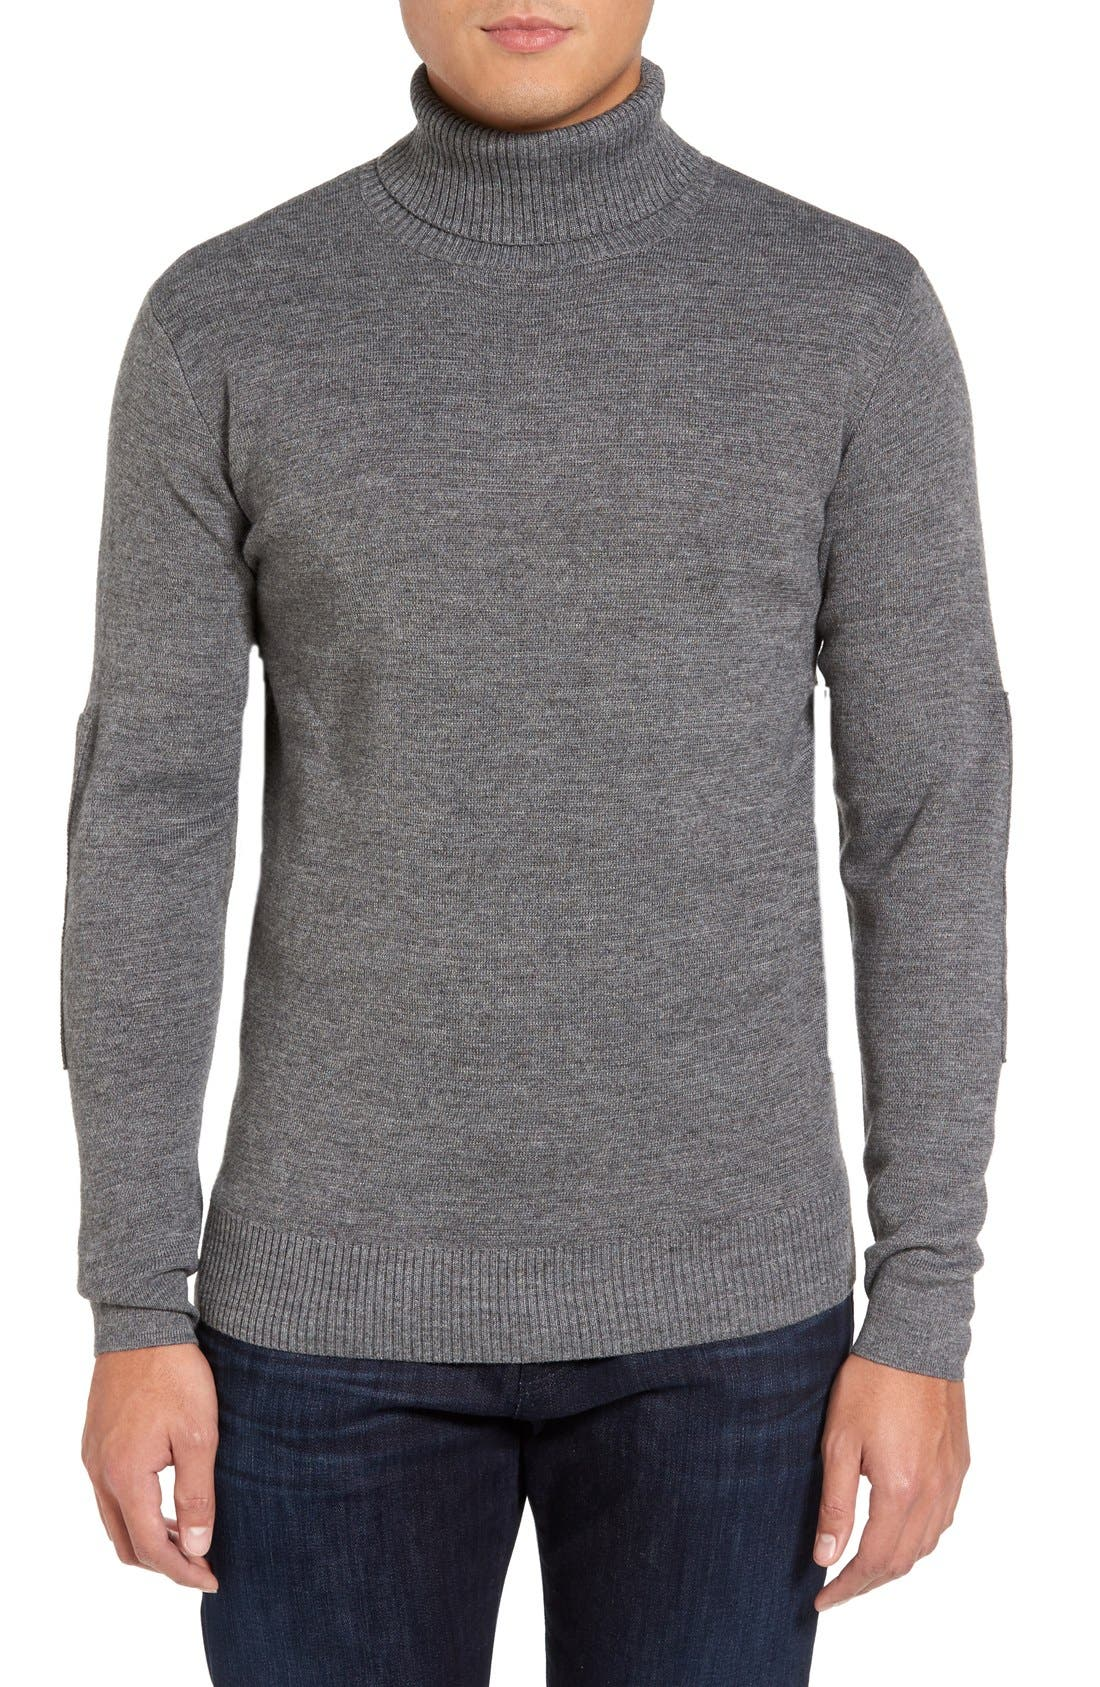 Merino Wool Blend Turtleneck Sweater,                         Main,                         color, Grey